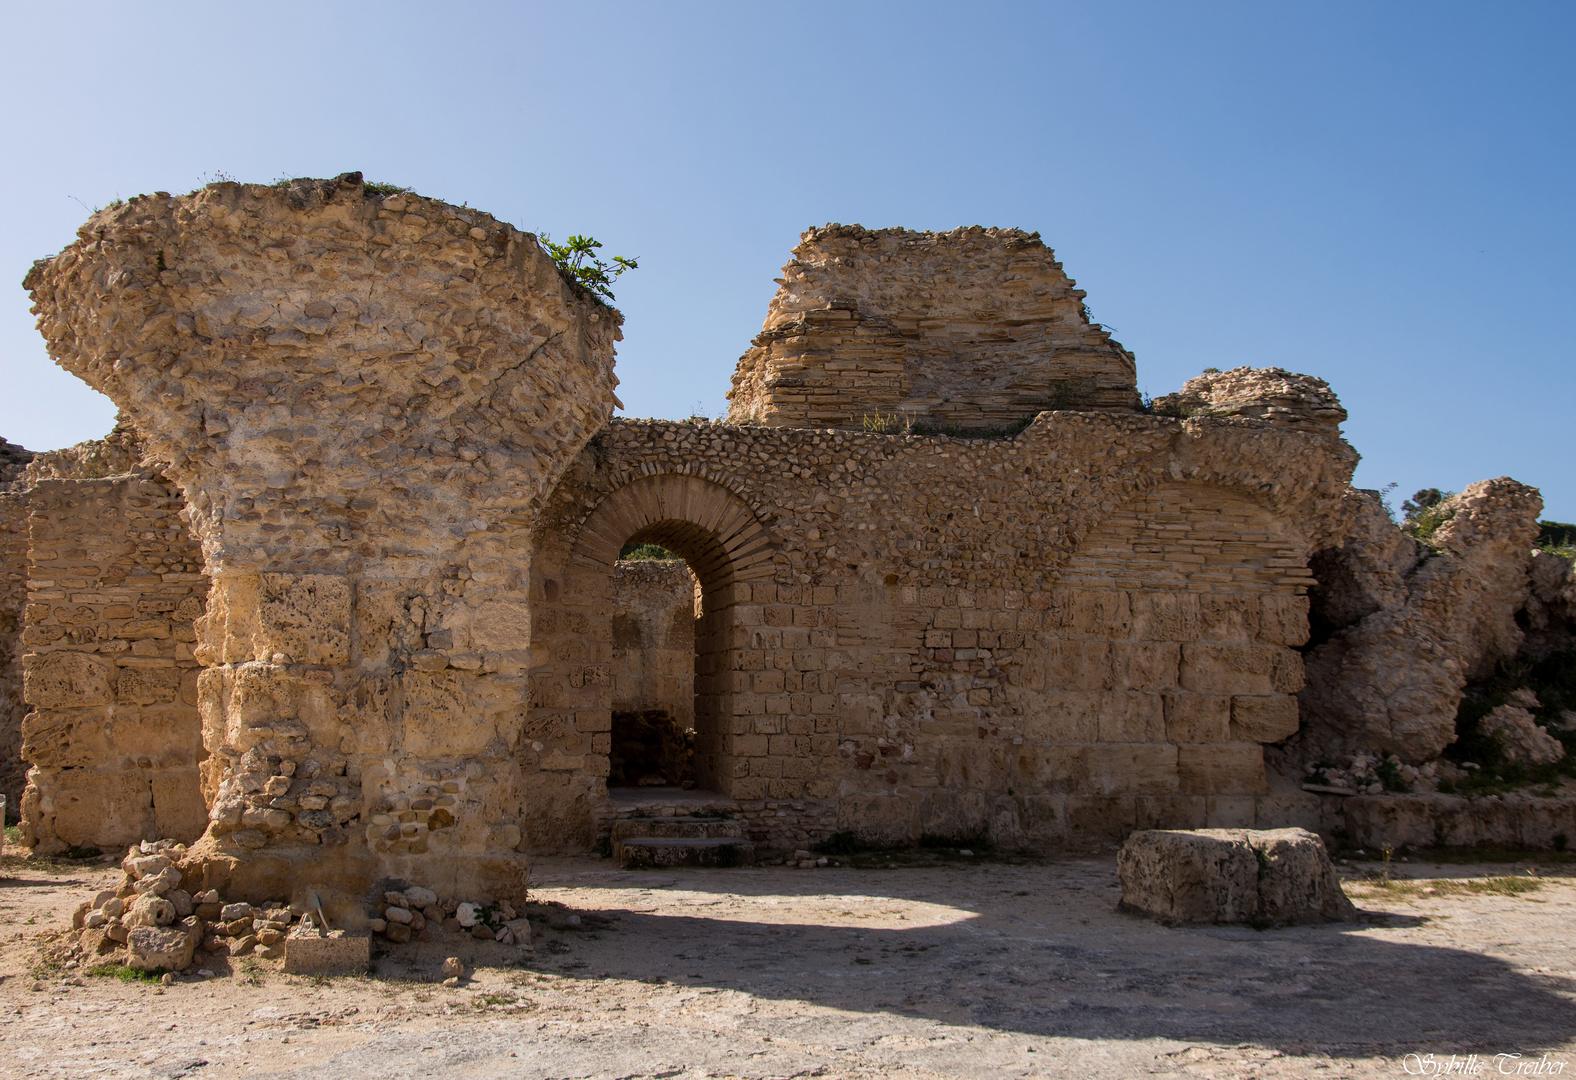 Antike Mauern